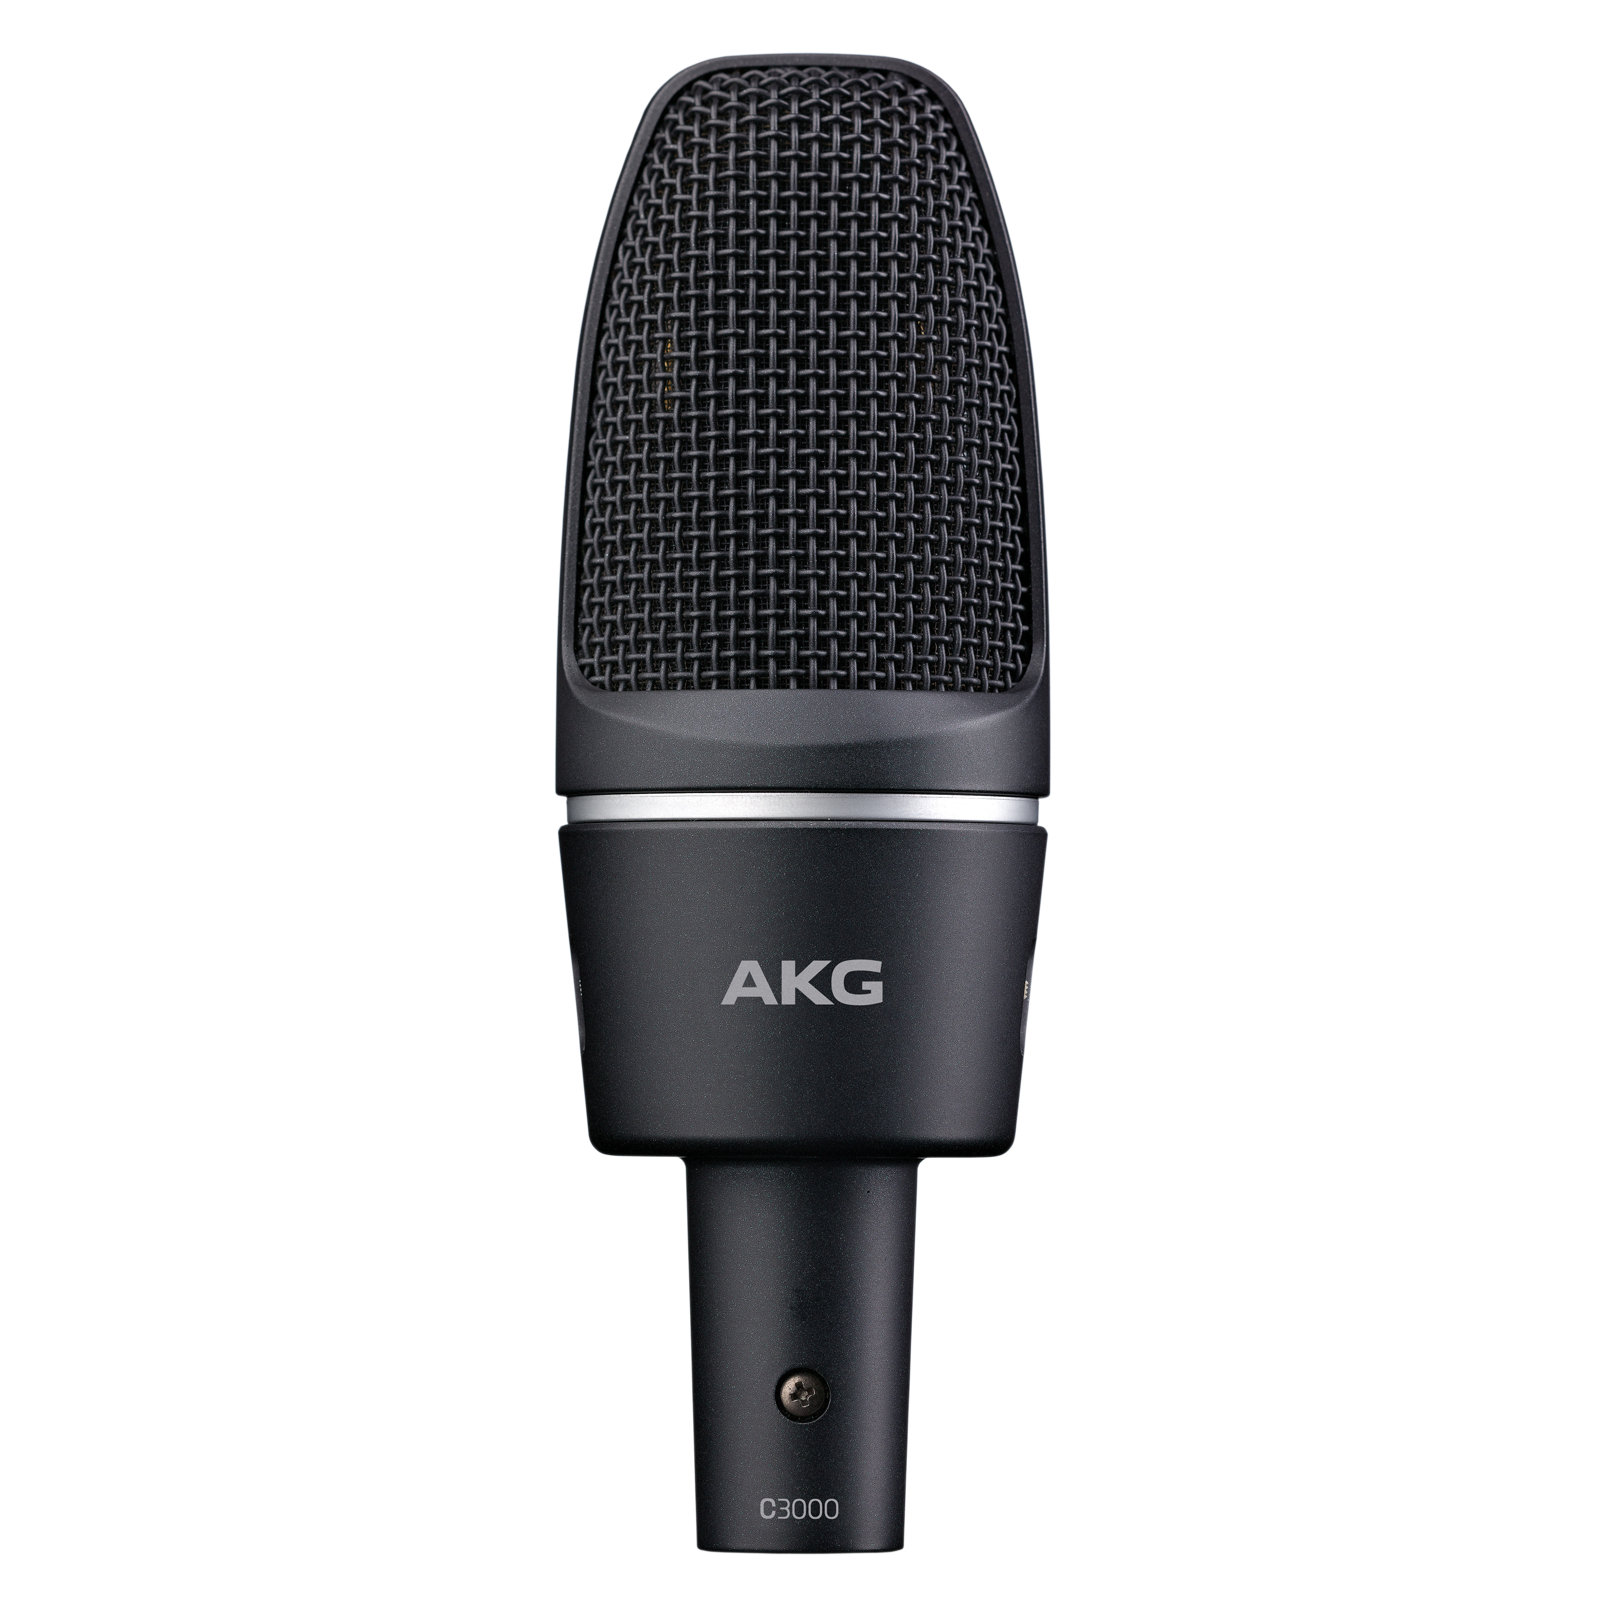 AKG_c3000_front_white